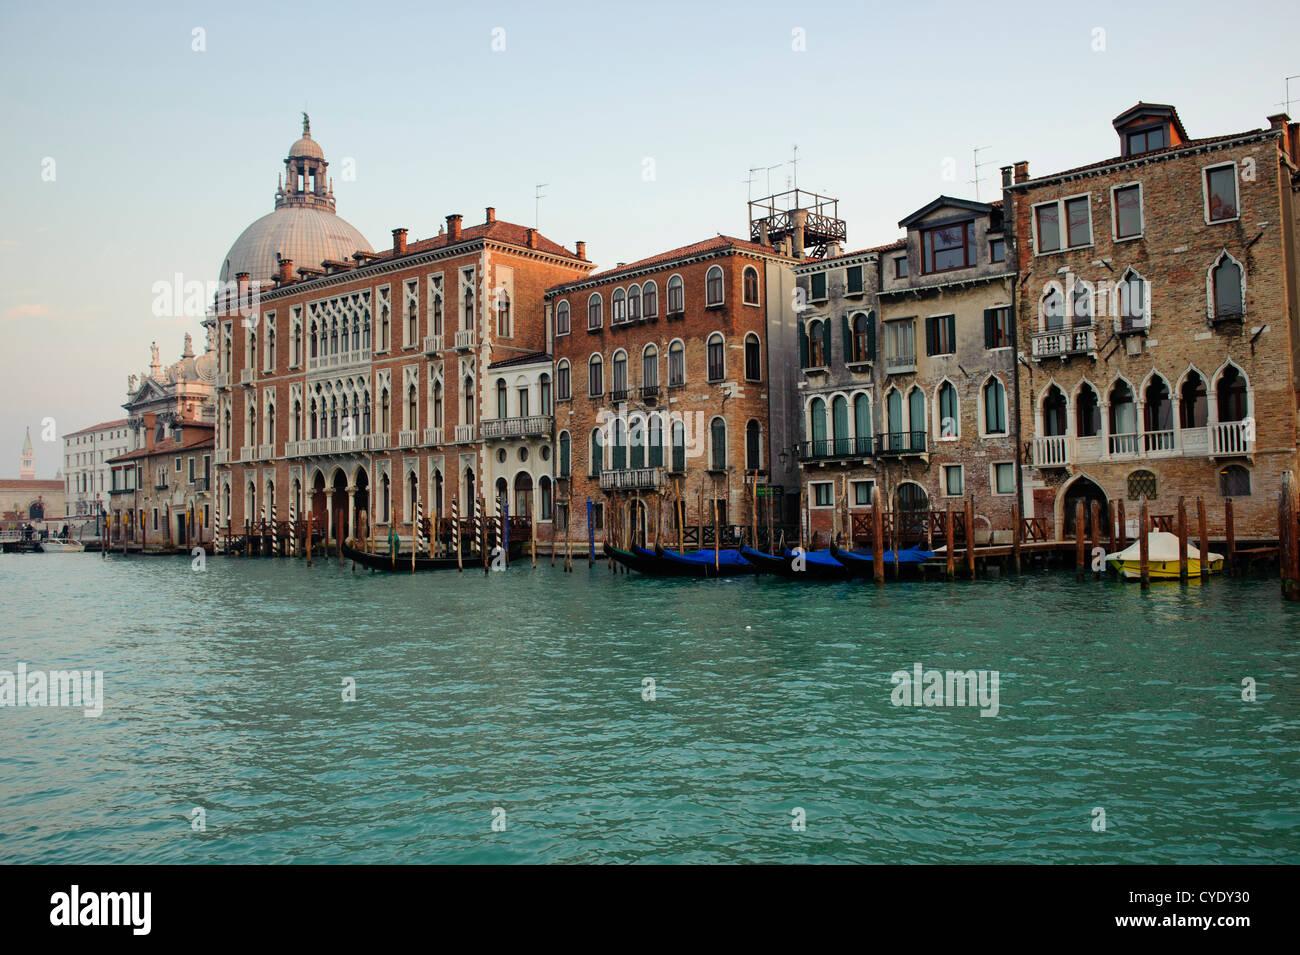 Building along the Grand Canal of Venice, Veneto, Italy. - Stock Image